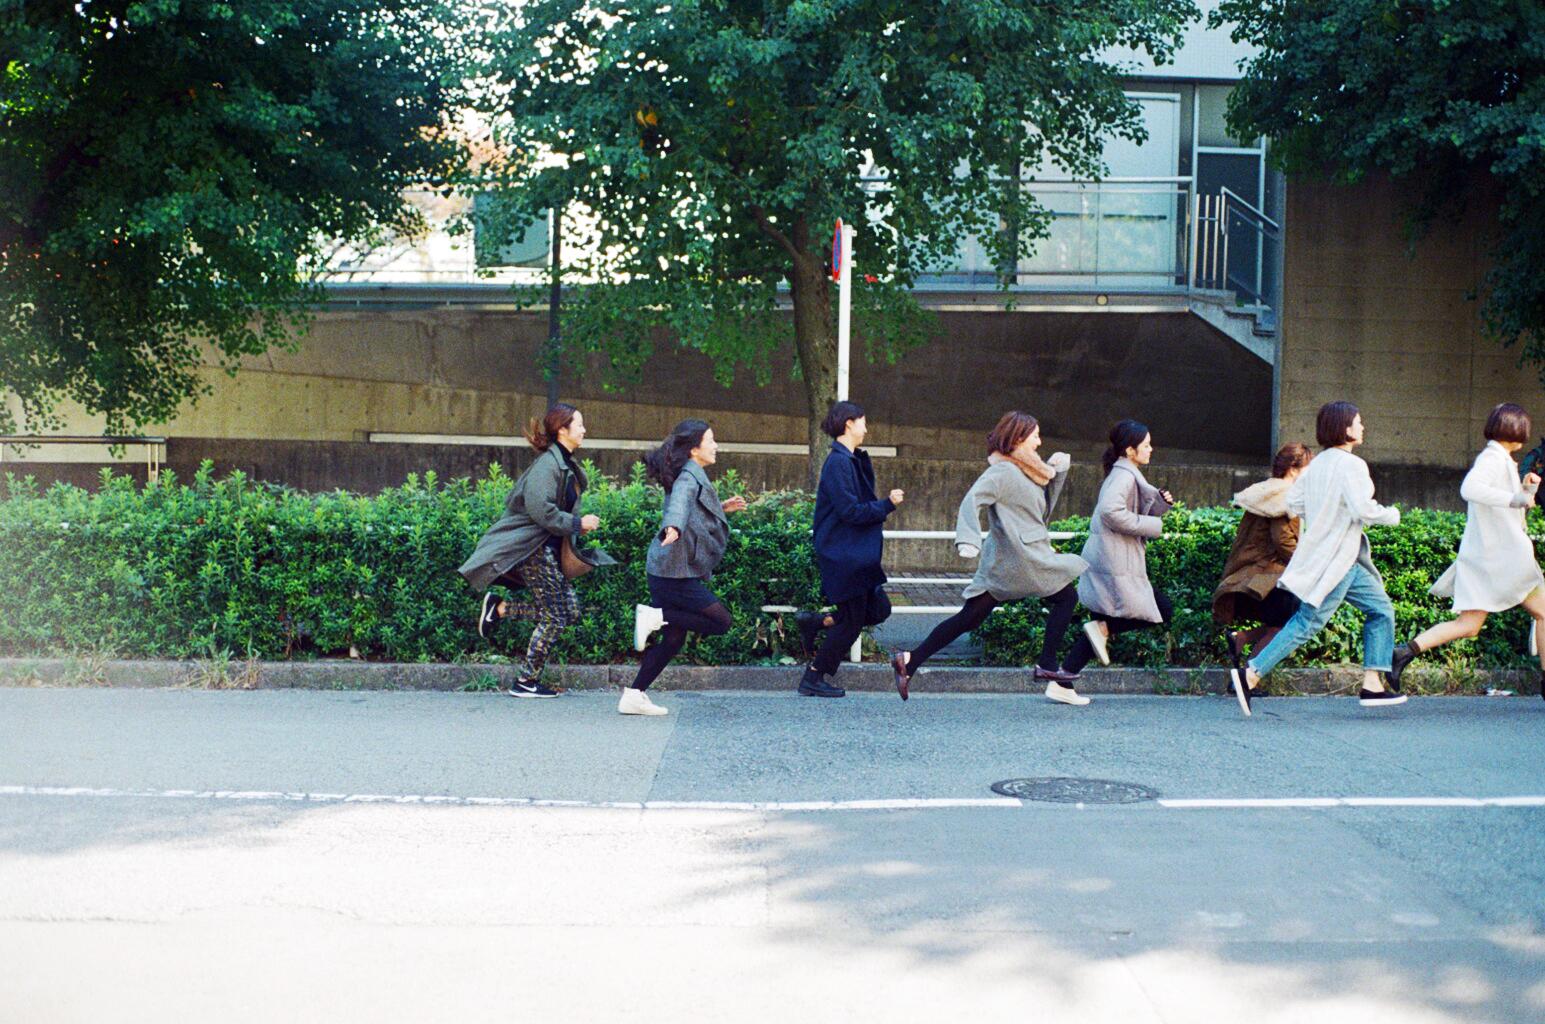 Women running on a coat_3.jpg